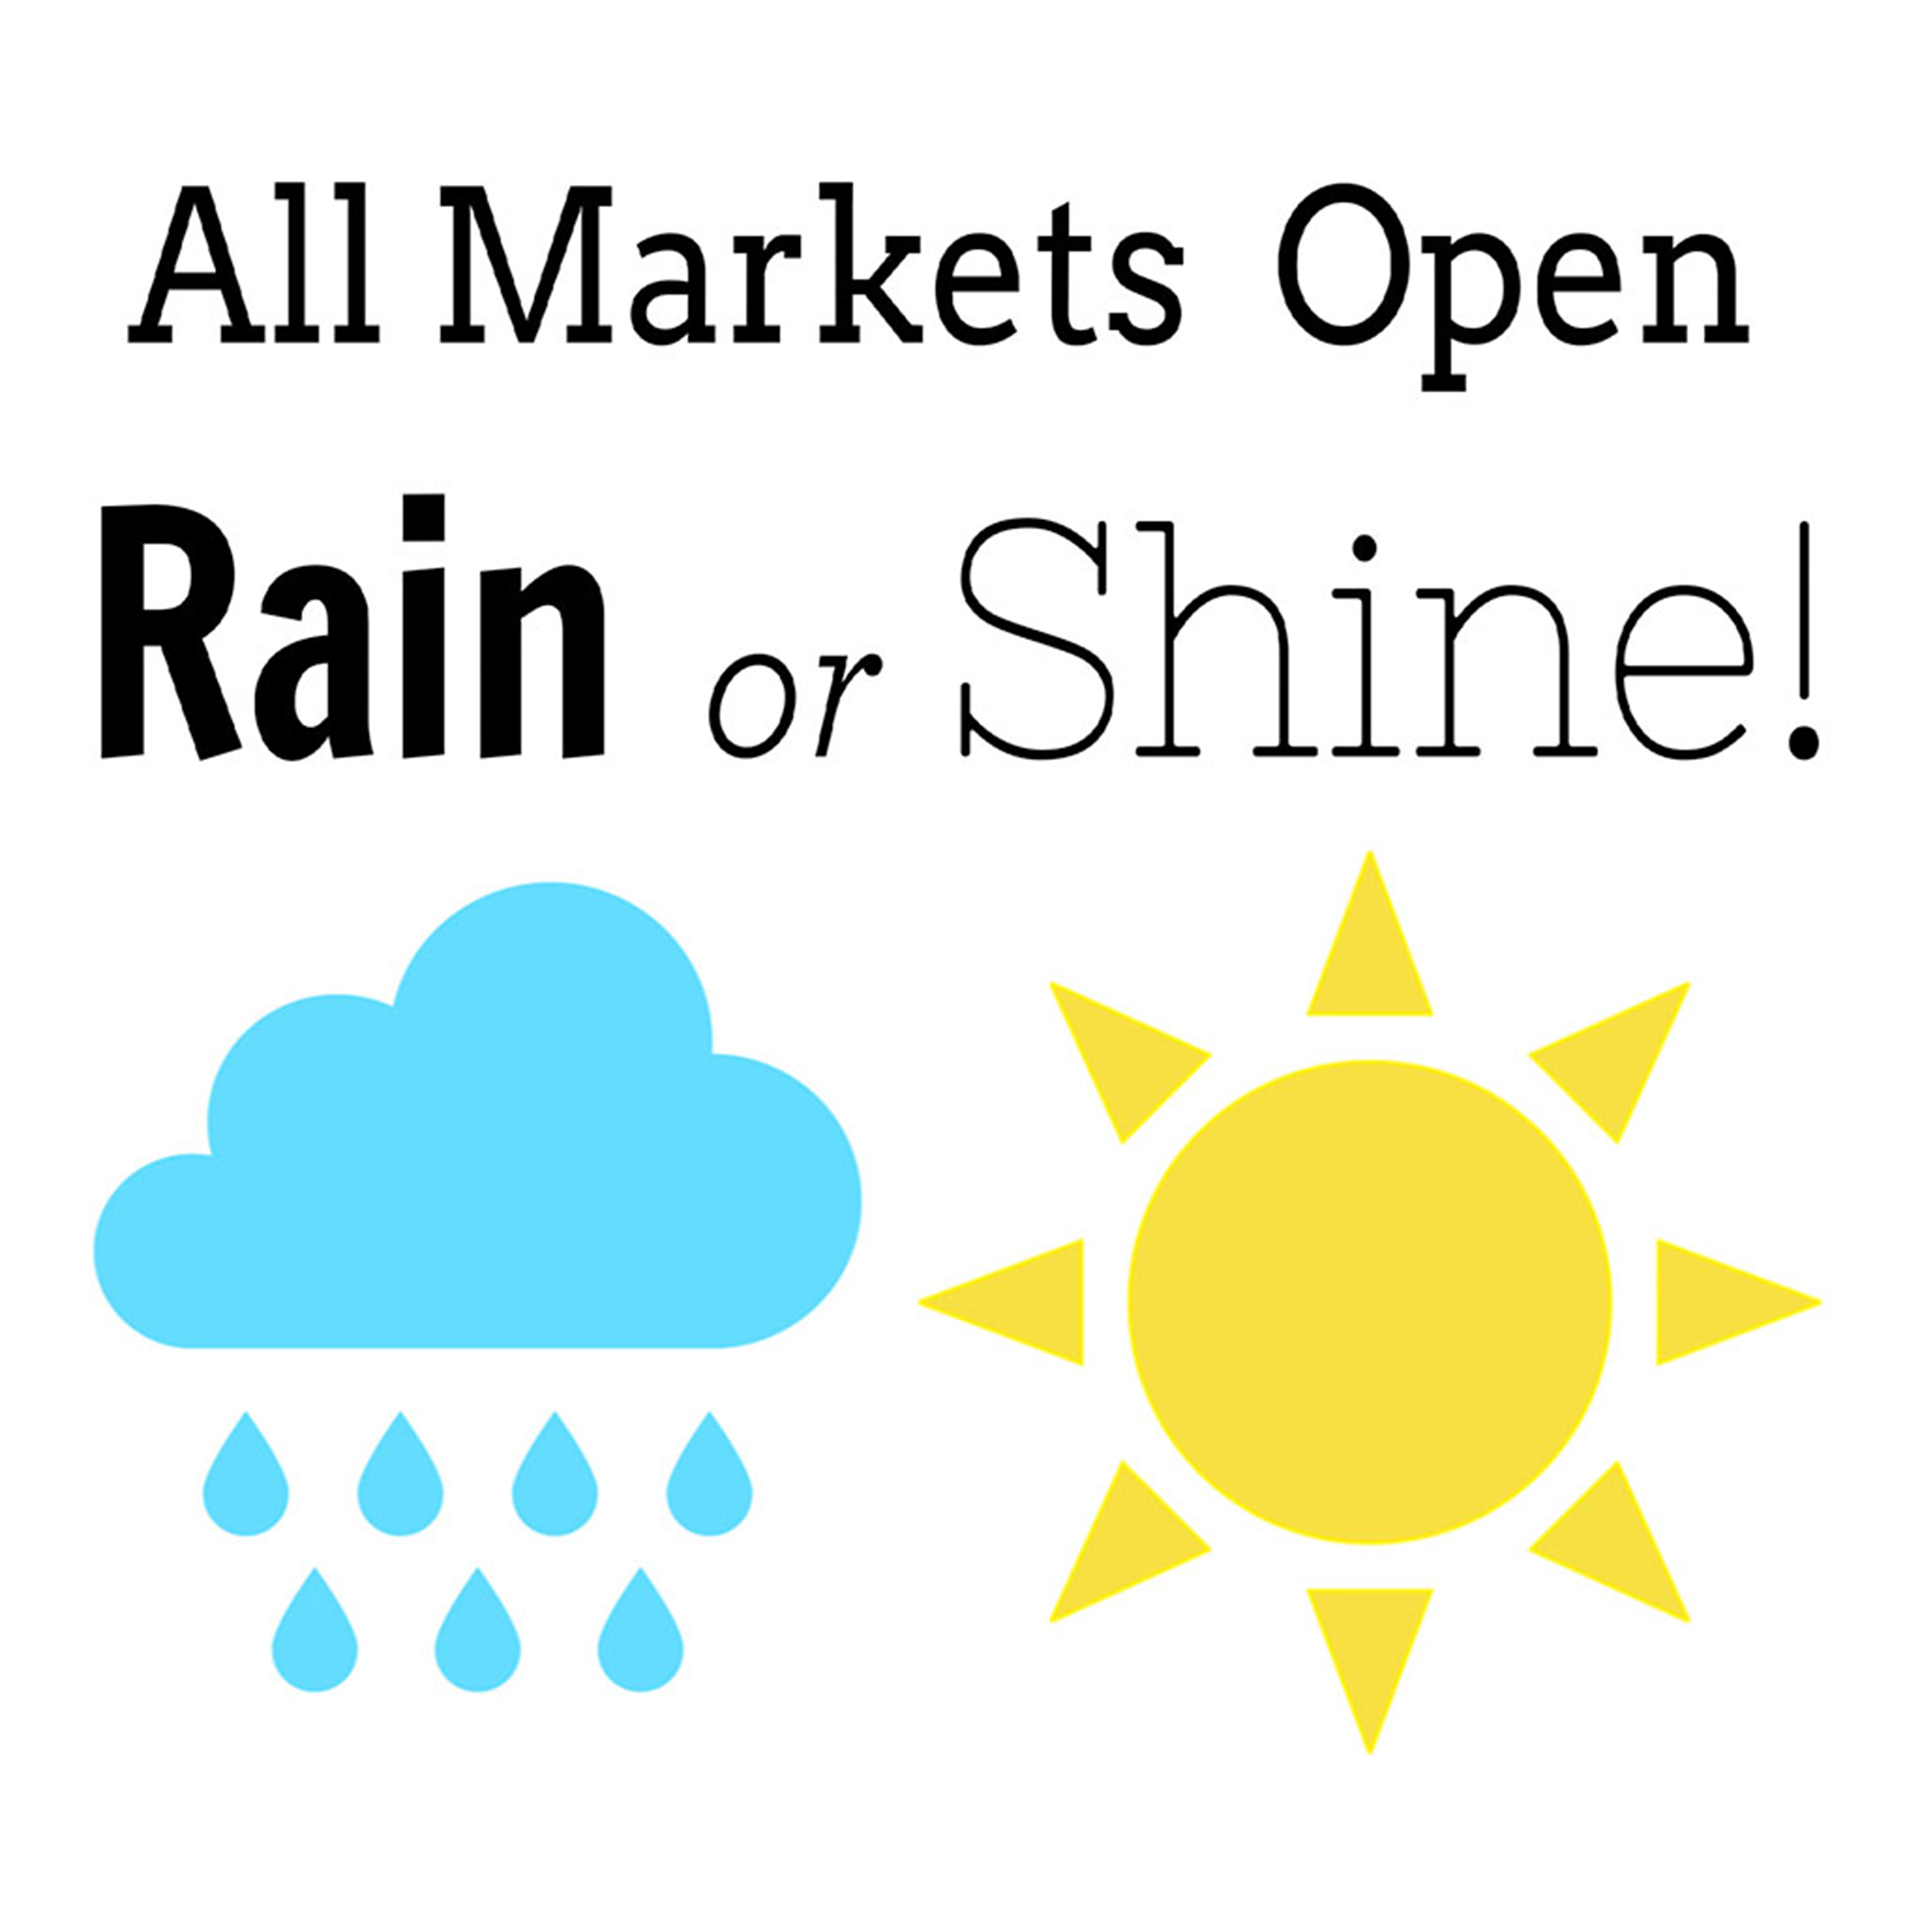 rain-or-shine.jpg